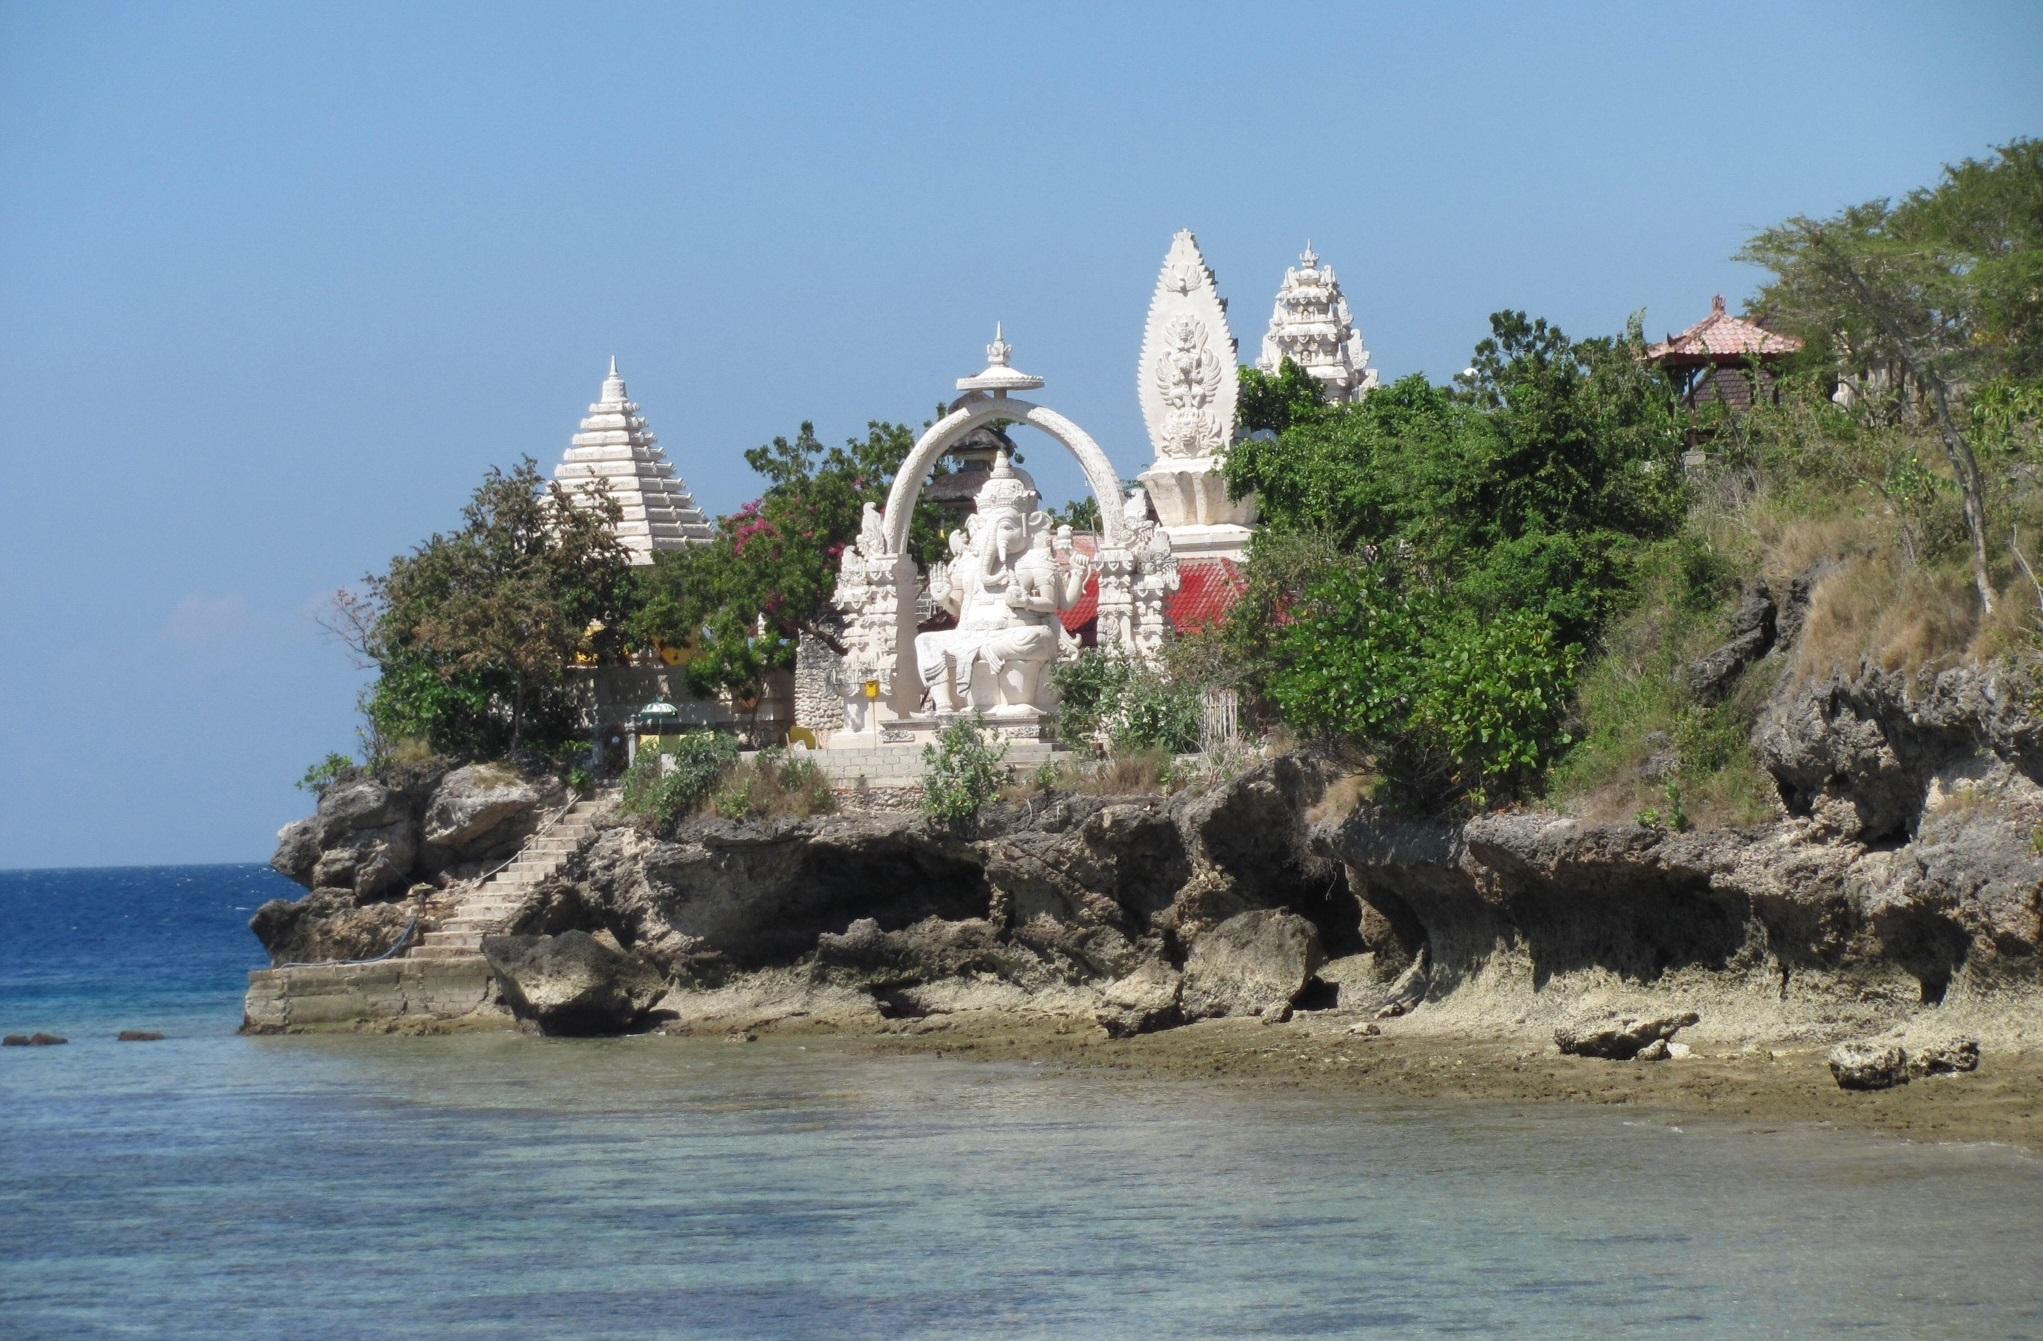 menjangan underwater attractions in west bali